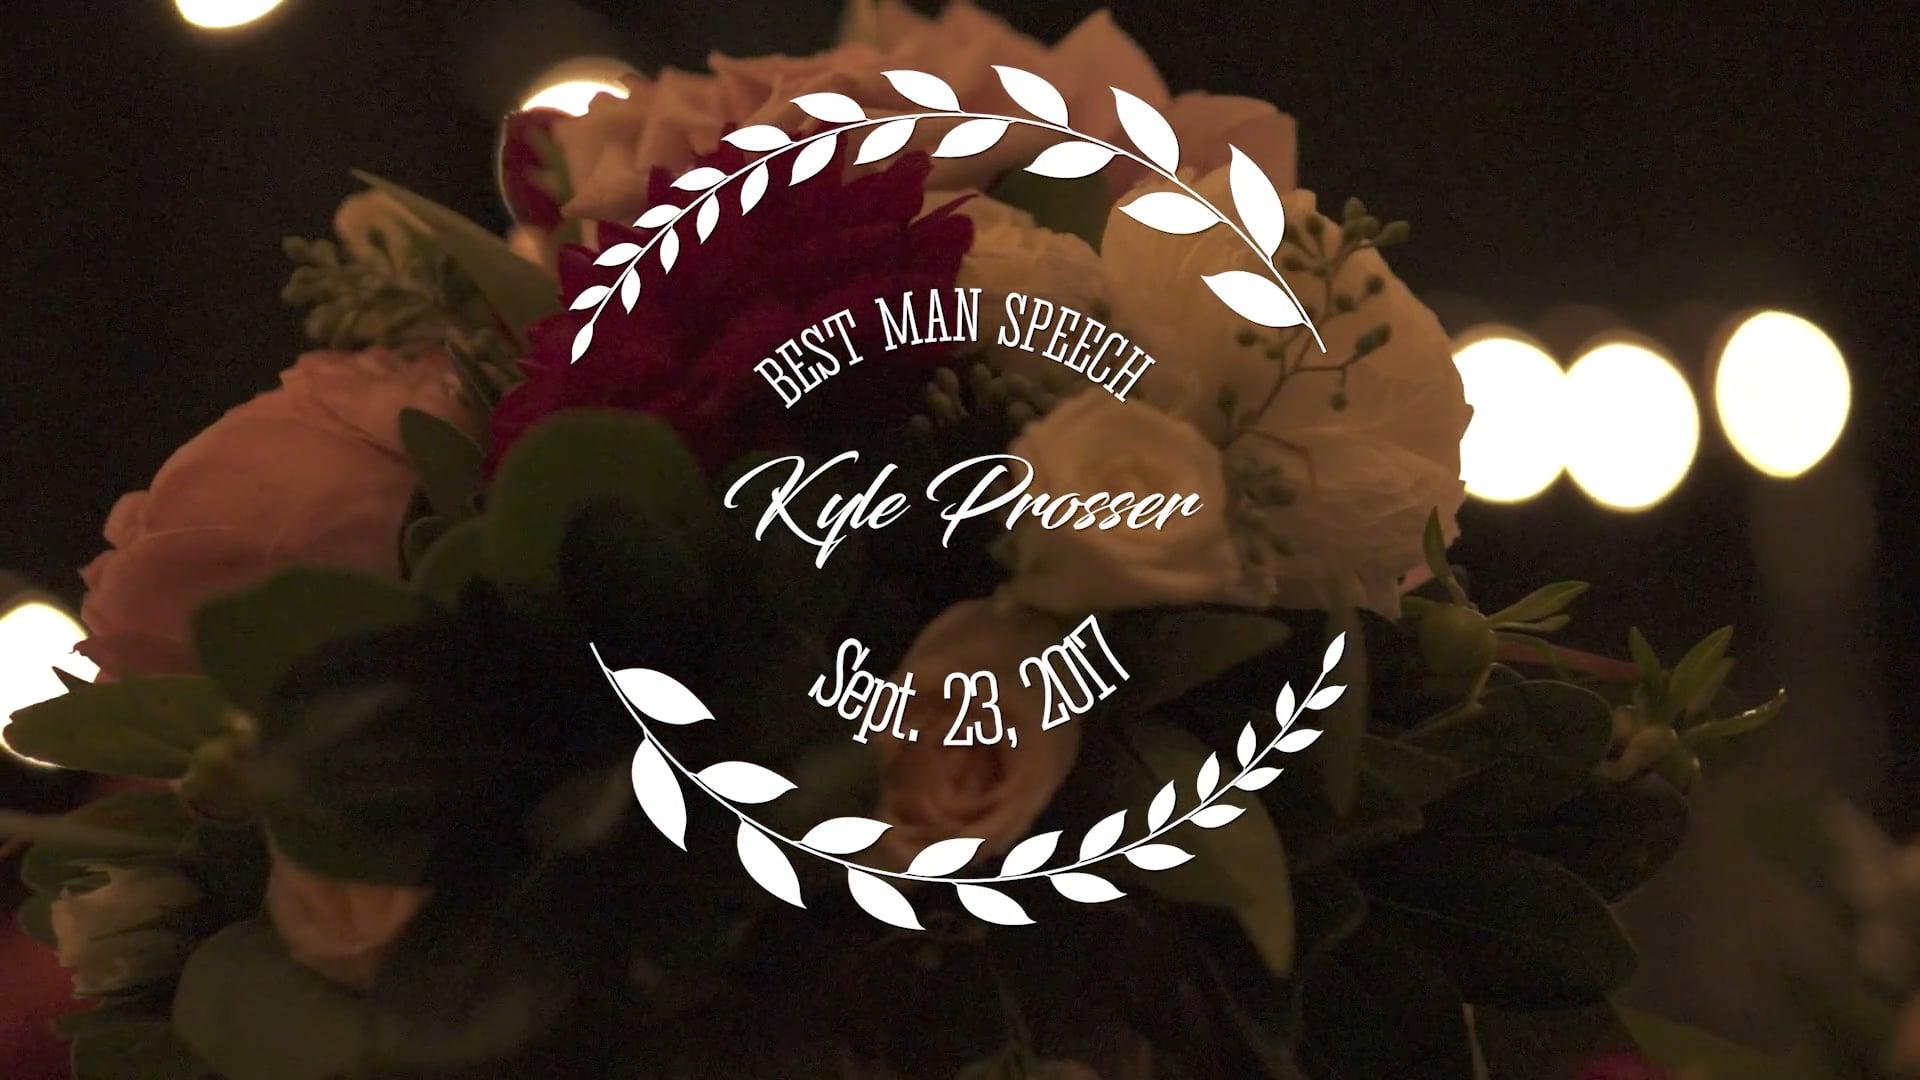 Melissa + Erik Prosser Wedding -  Best Man Speech